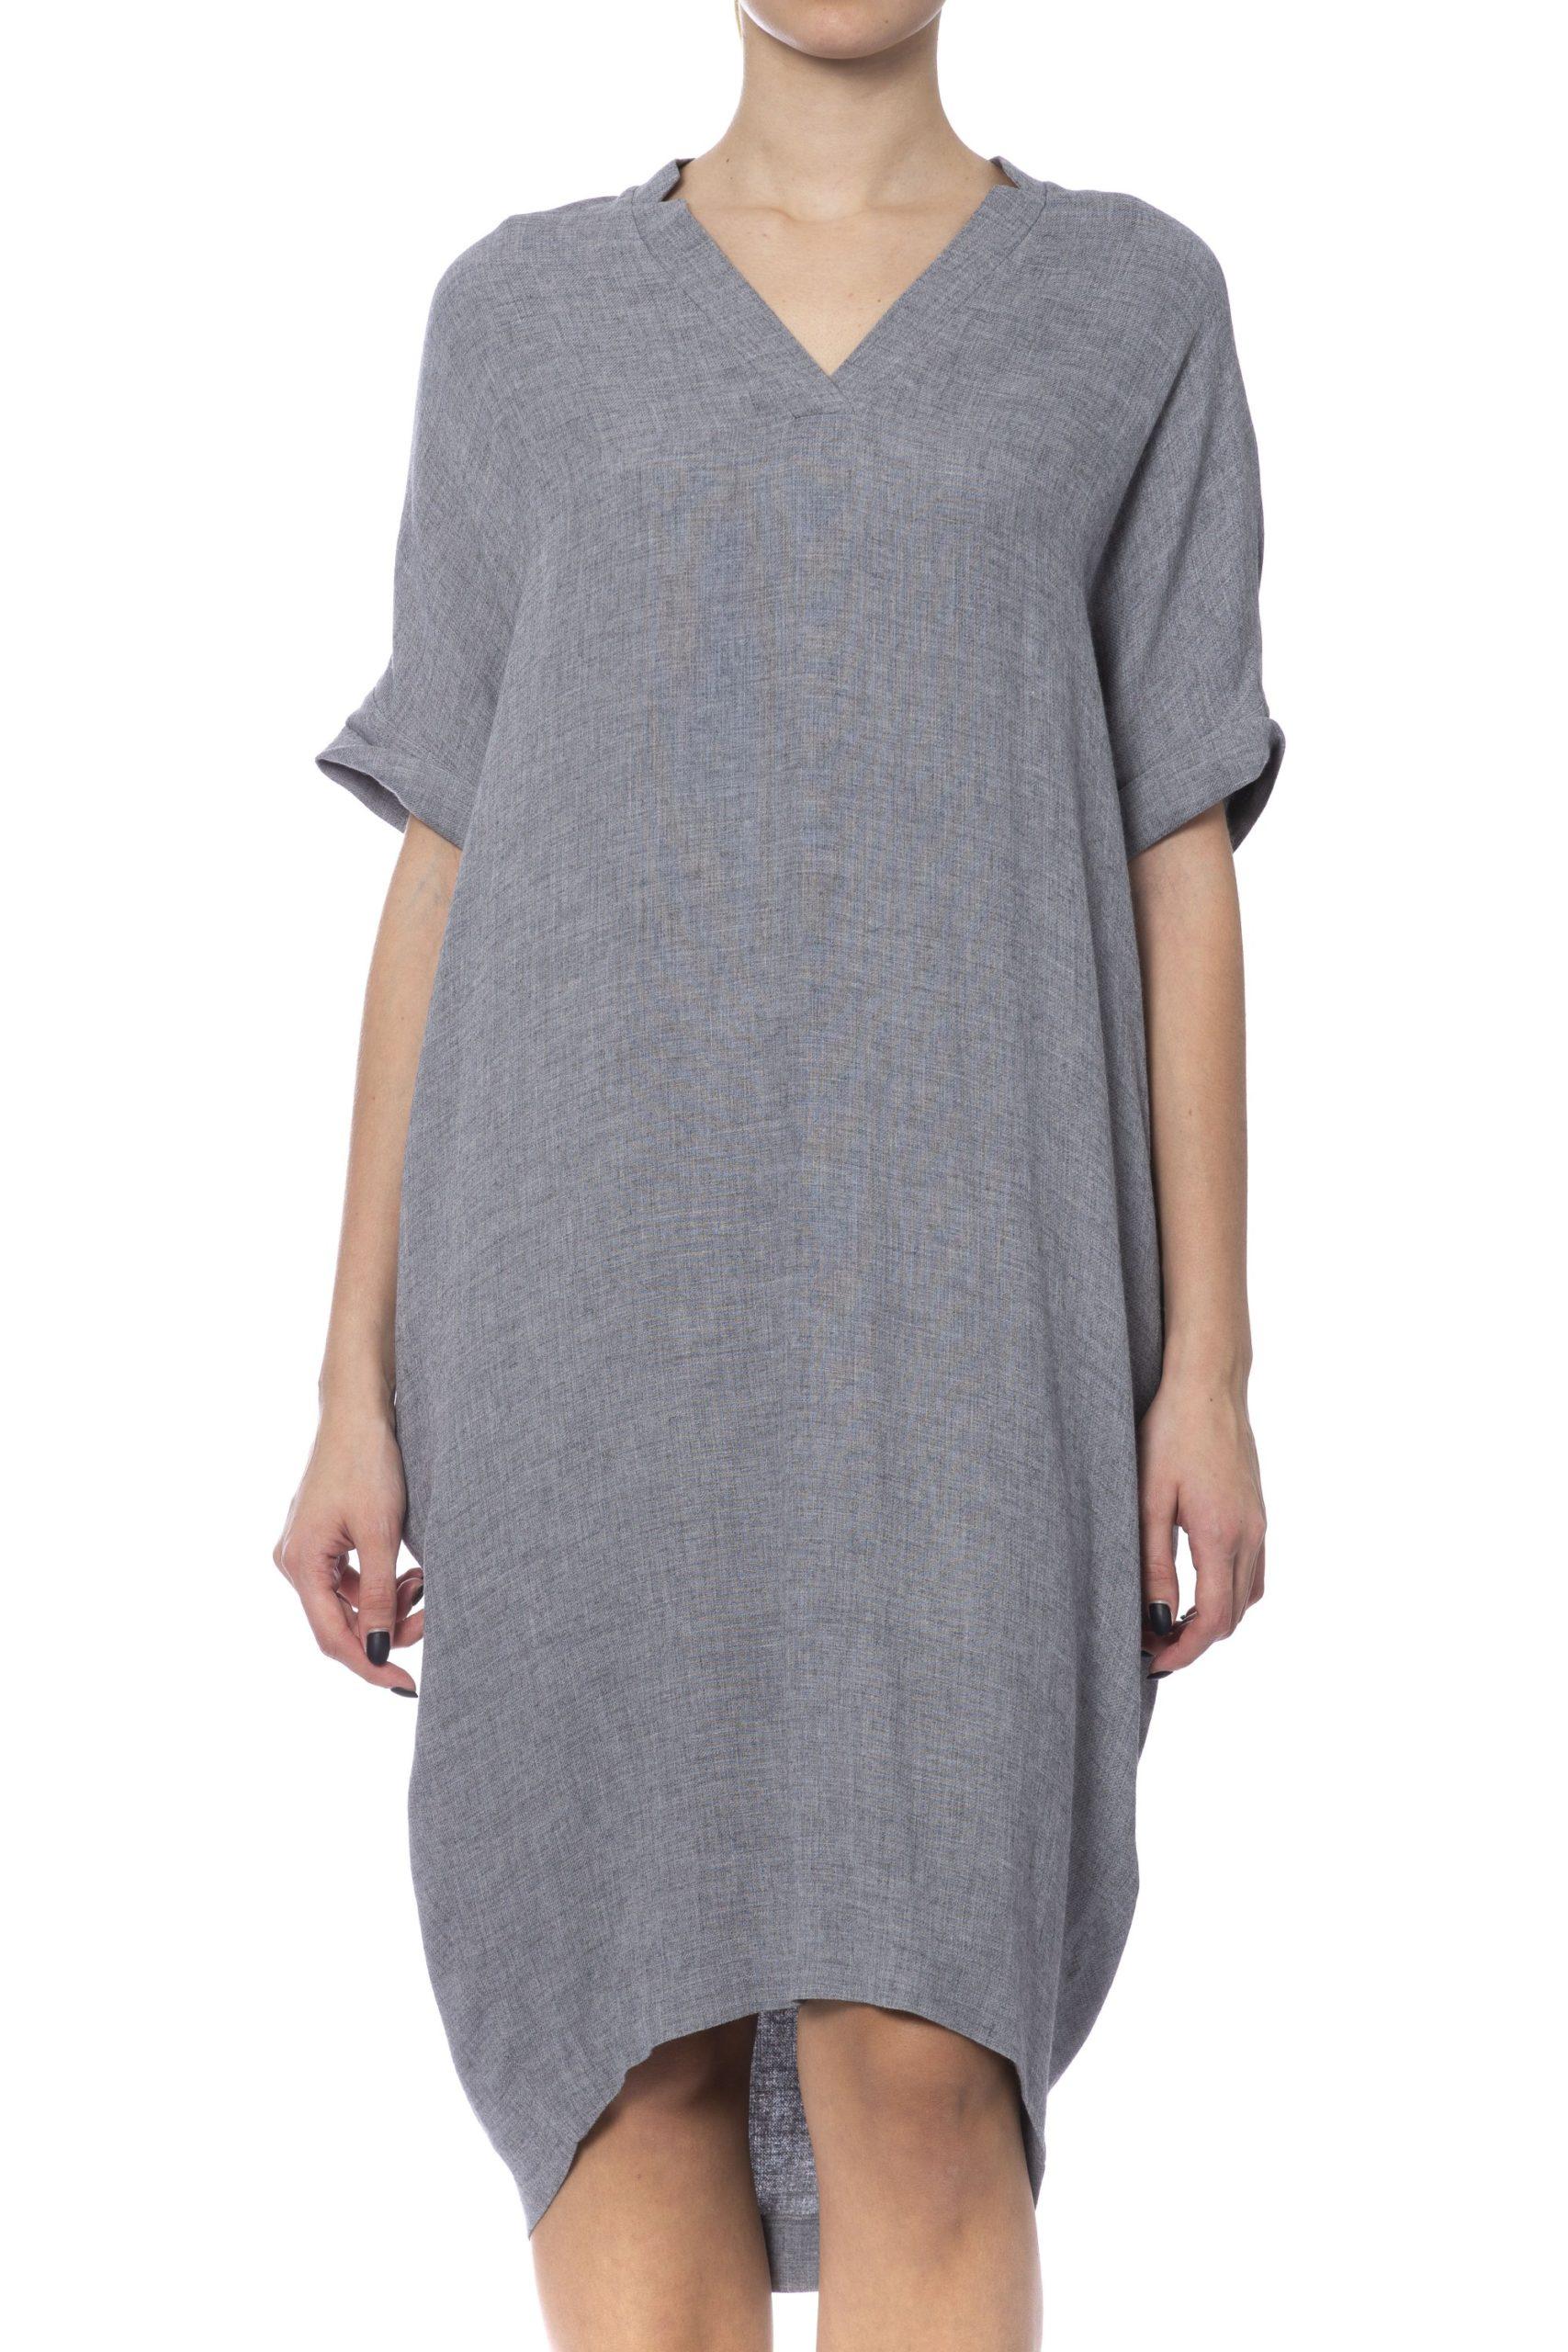 Peserico Women's Dress Grey PE992294 - IT42   S